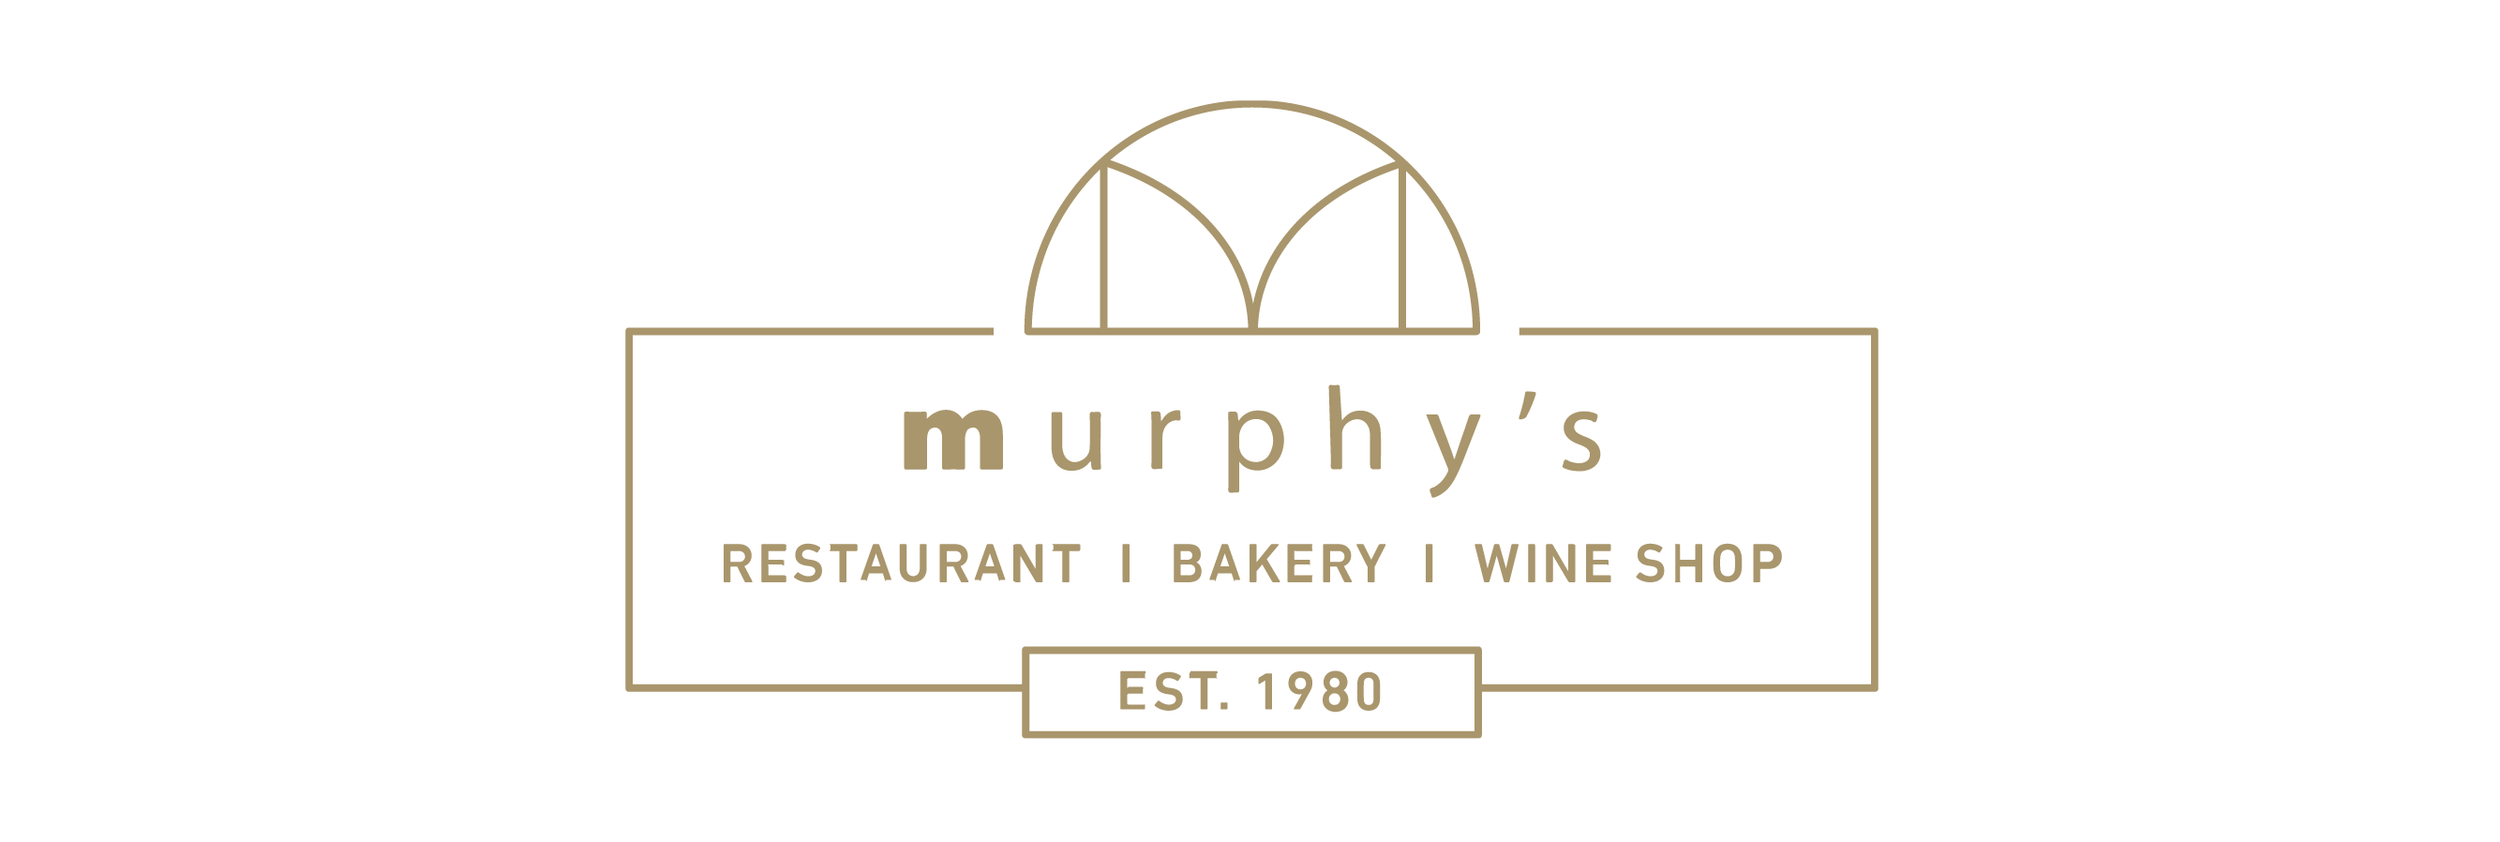 Murphys-05.png